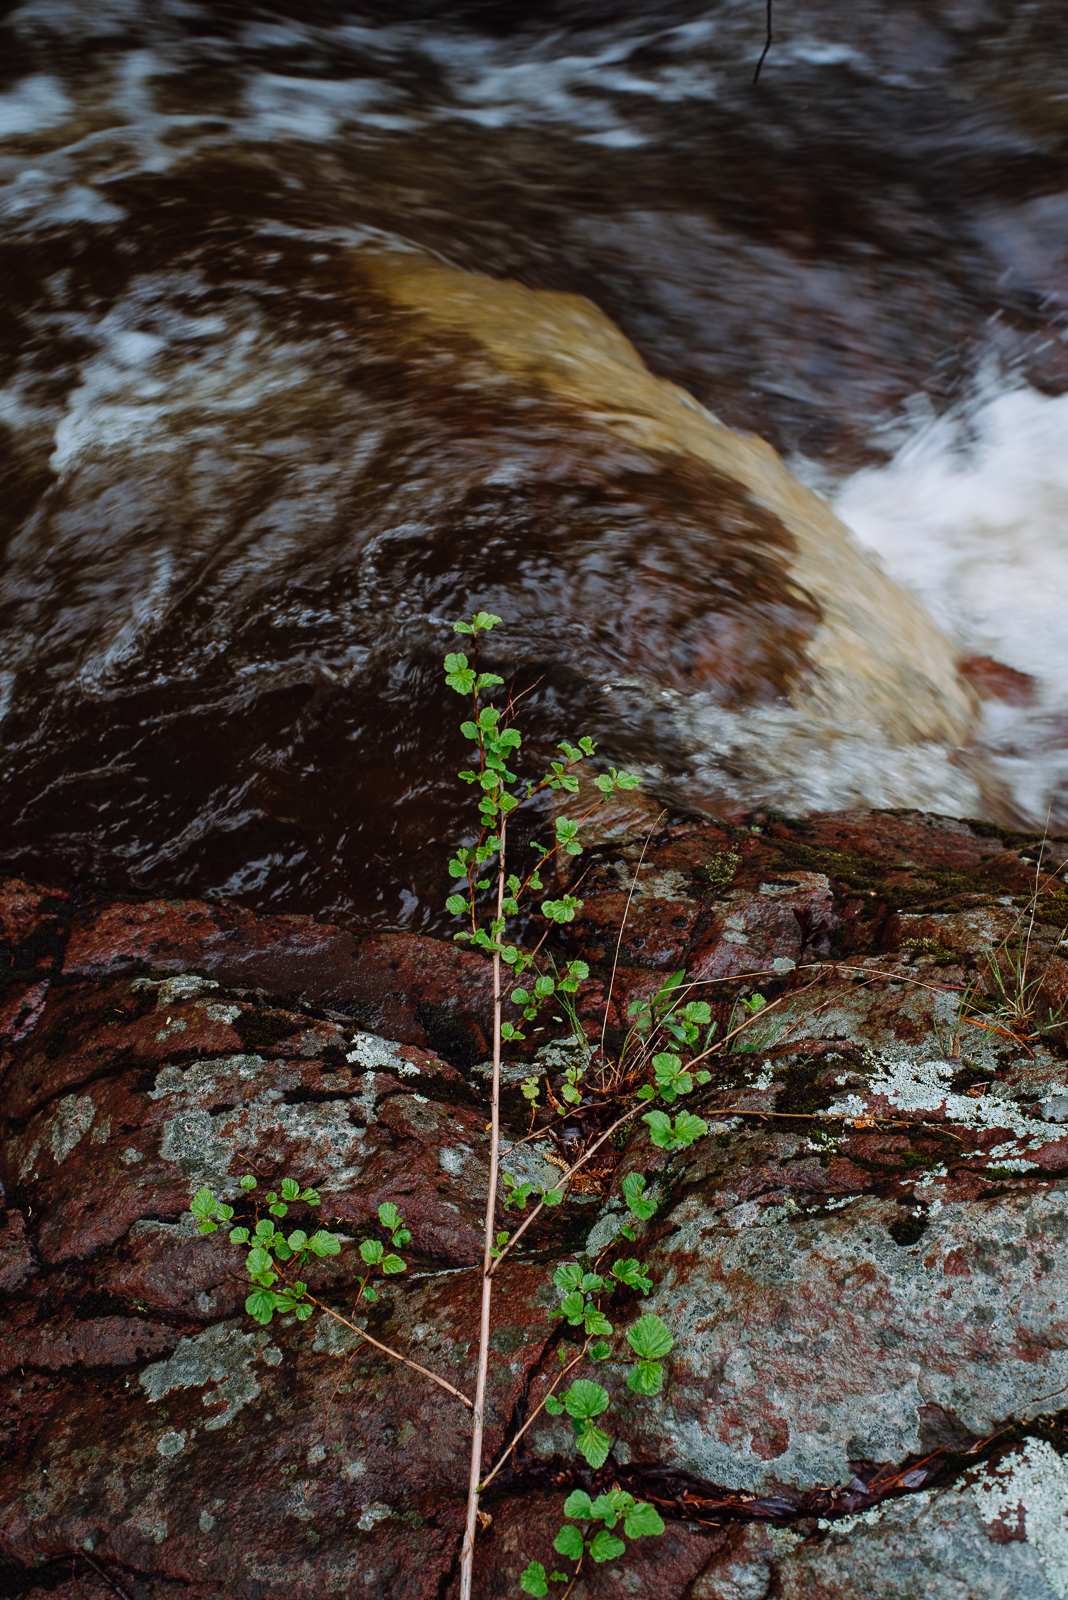 tischer-creek-5-21-2017-1599.jpg